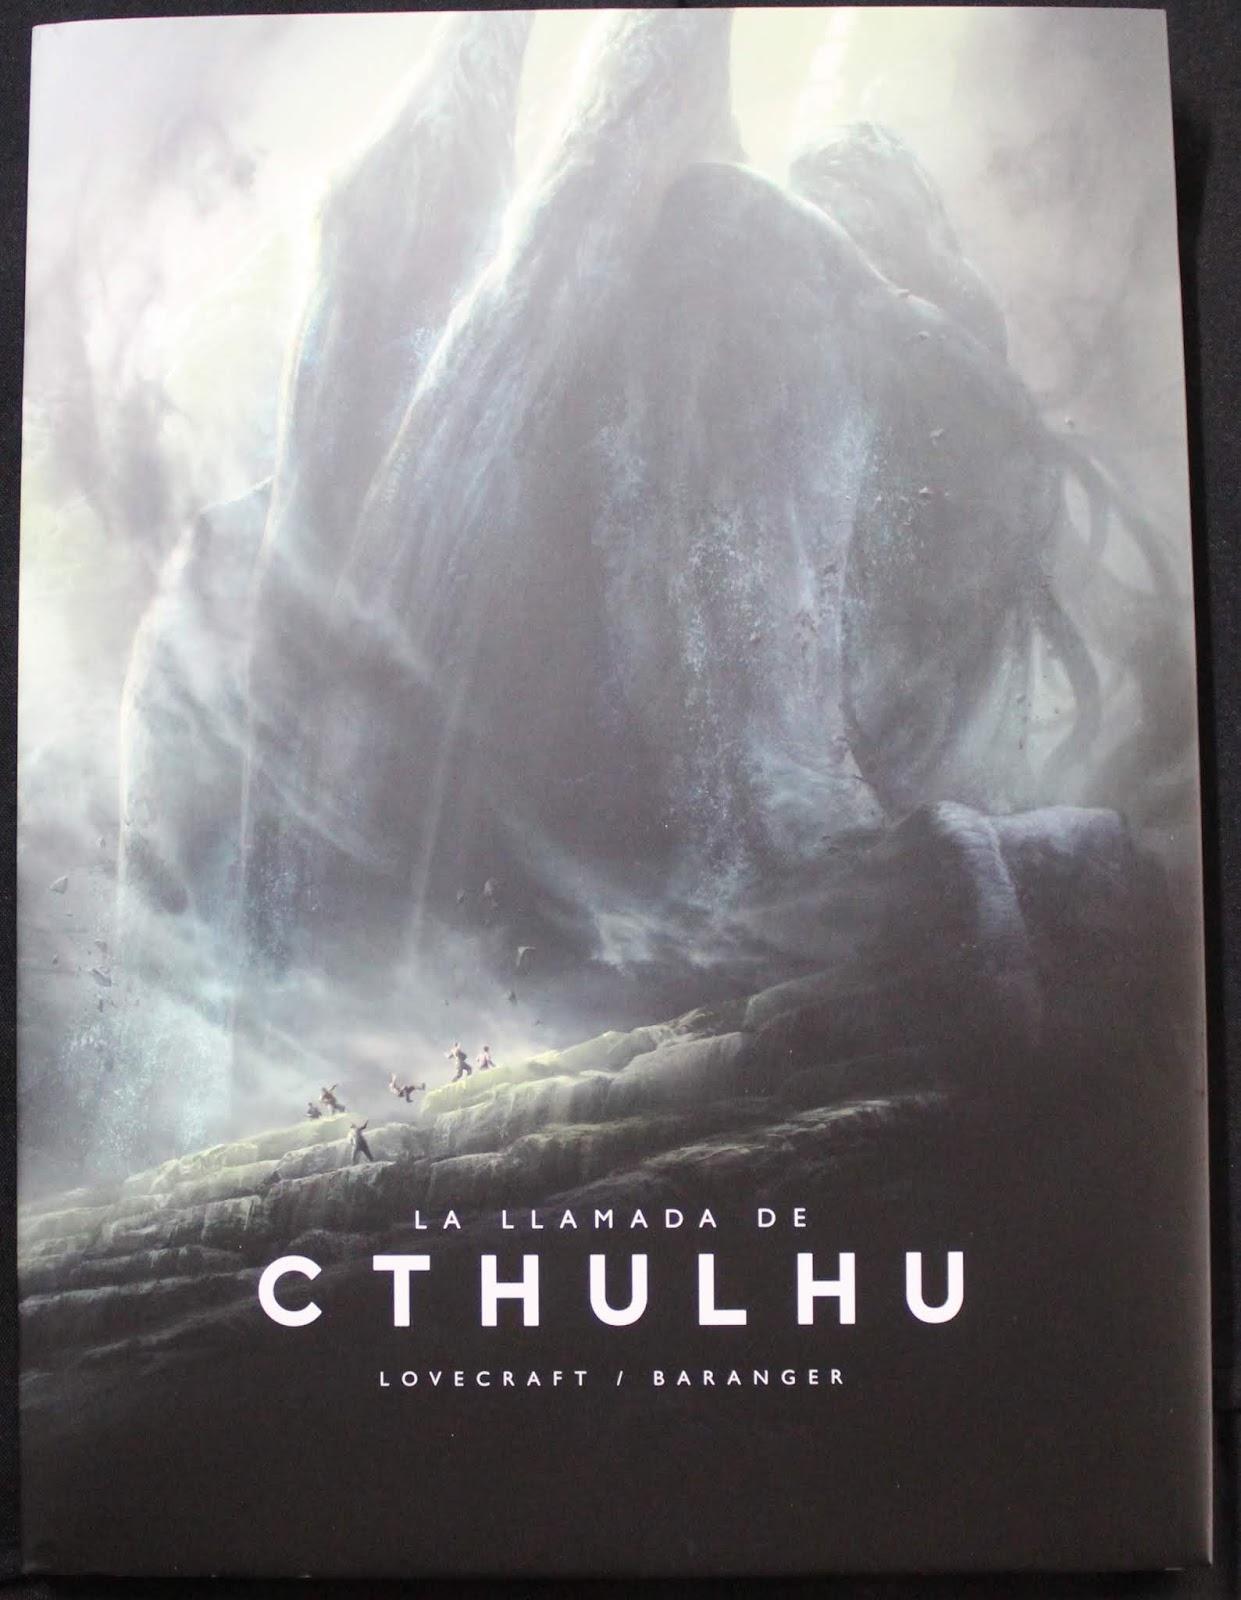 La llamada de Cthulhu ilustrada por François Baranger